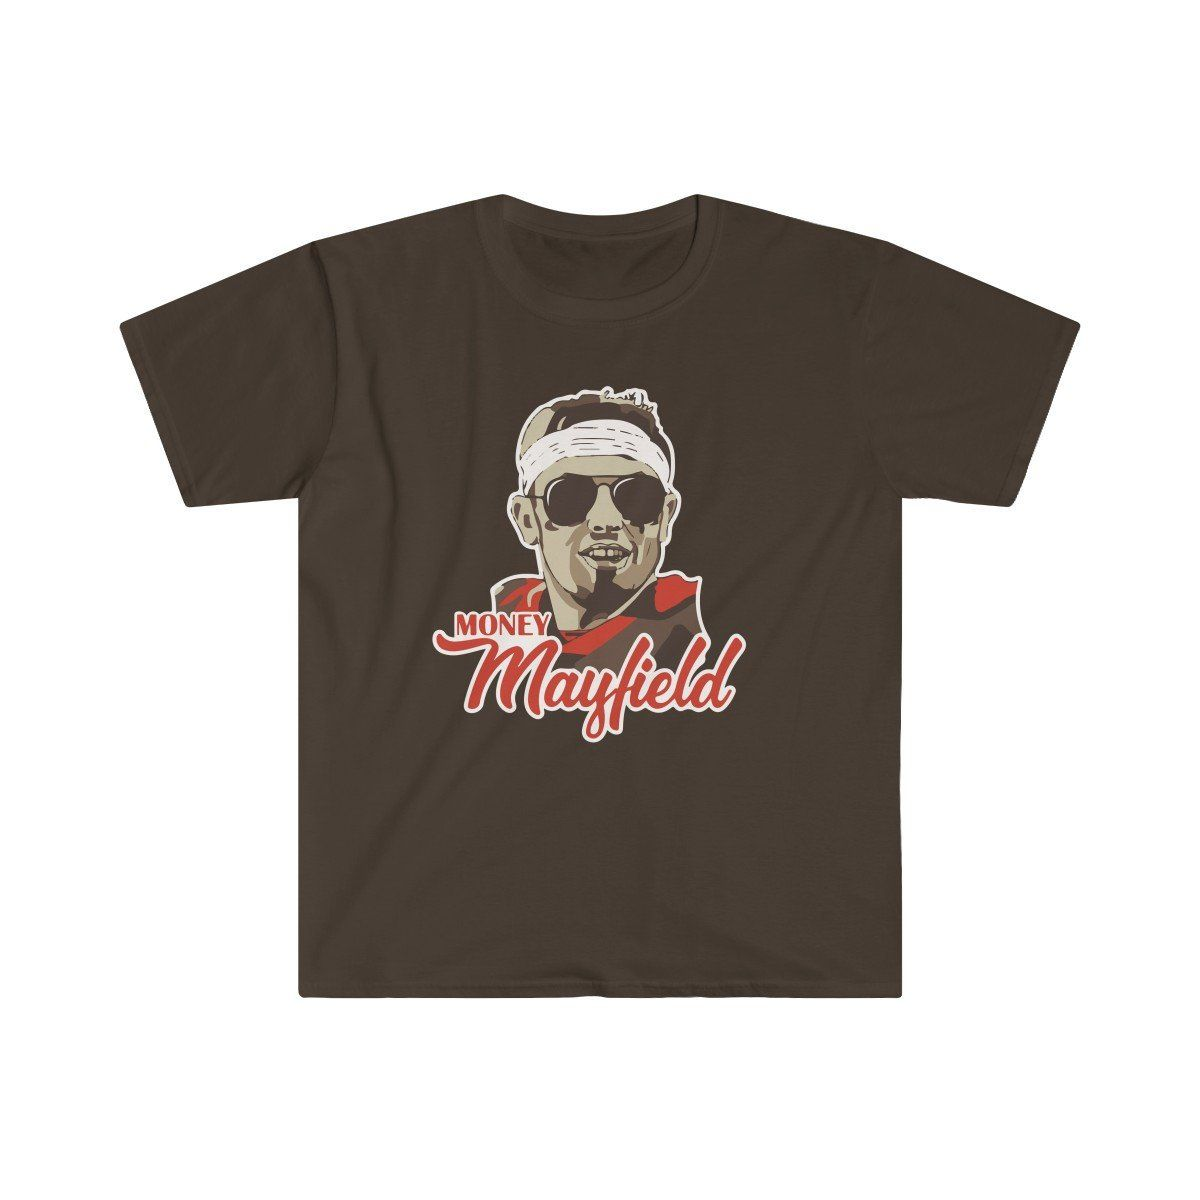 1cc4f2cbc242 Money Mayfield T-Shirt, Cleveland Browns T-Shirt, Baker Mayfield T-Shirt